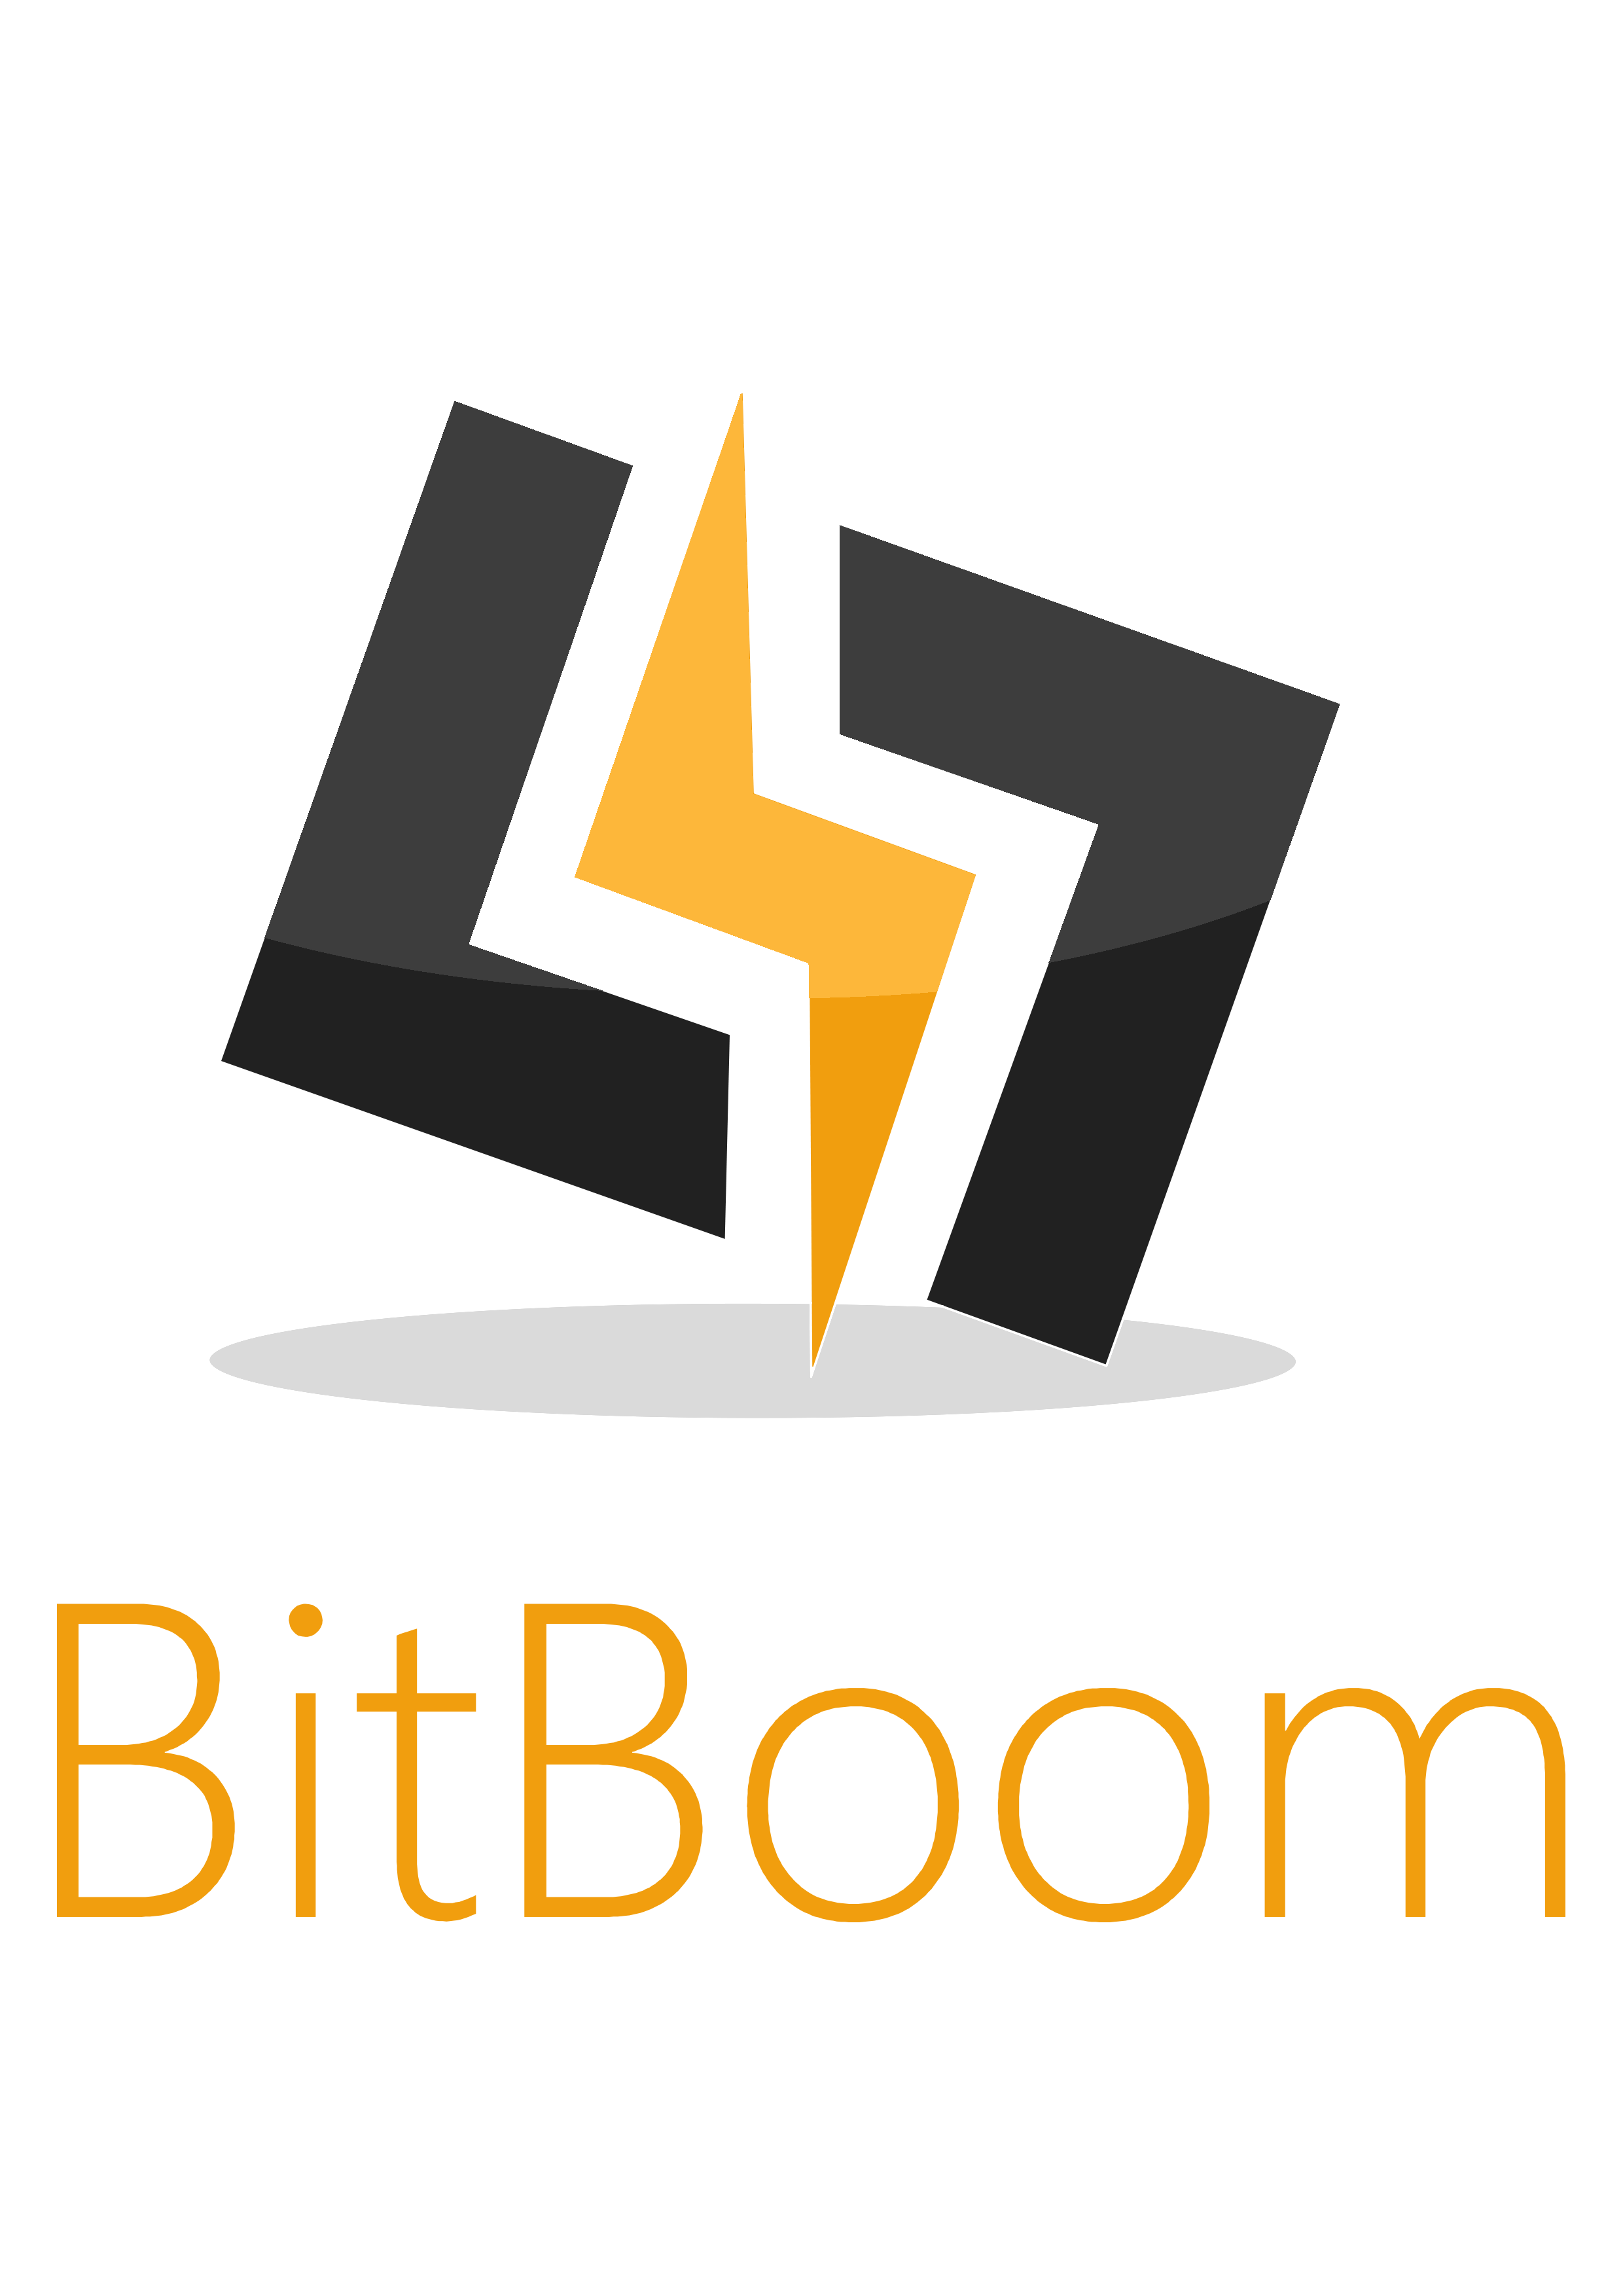 BitBoomlogo